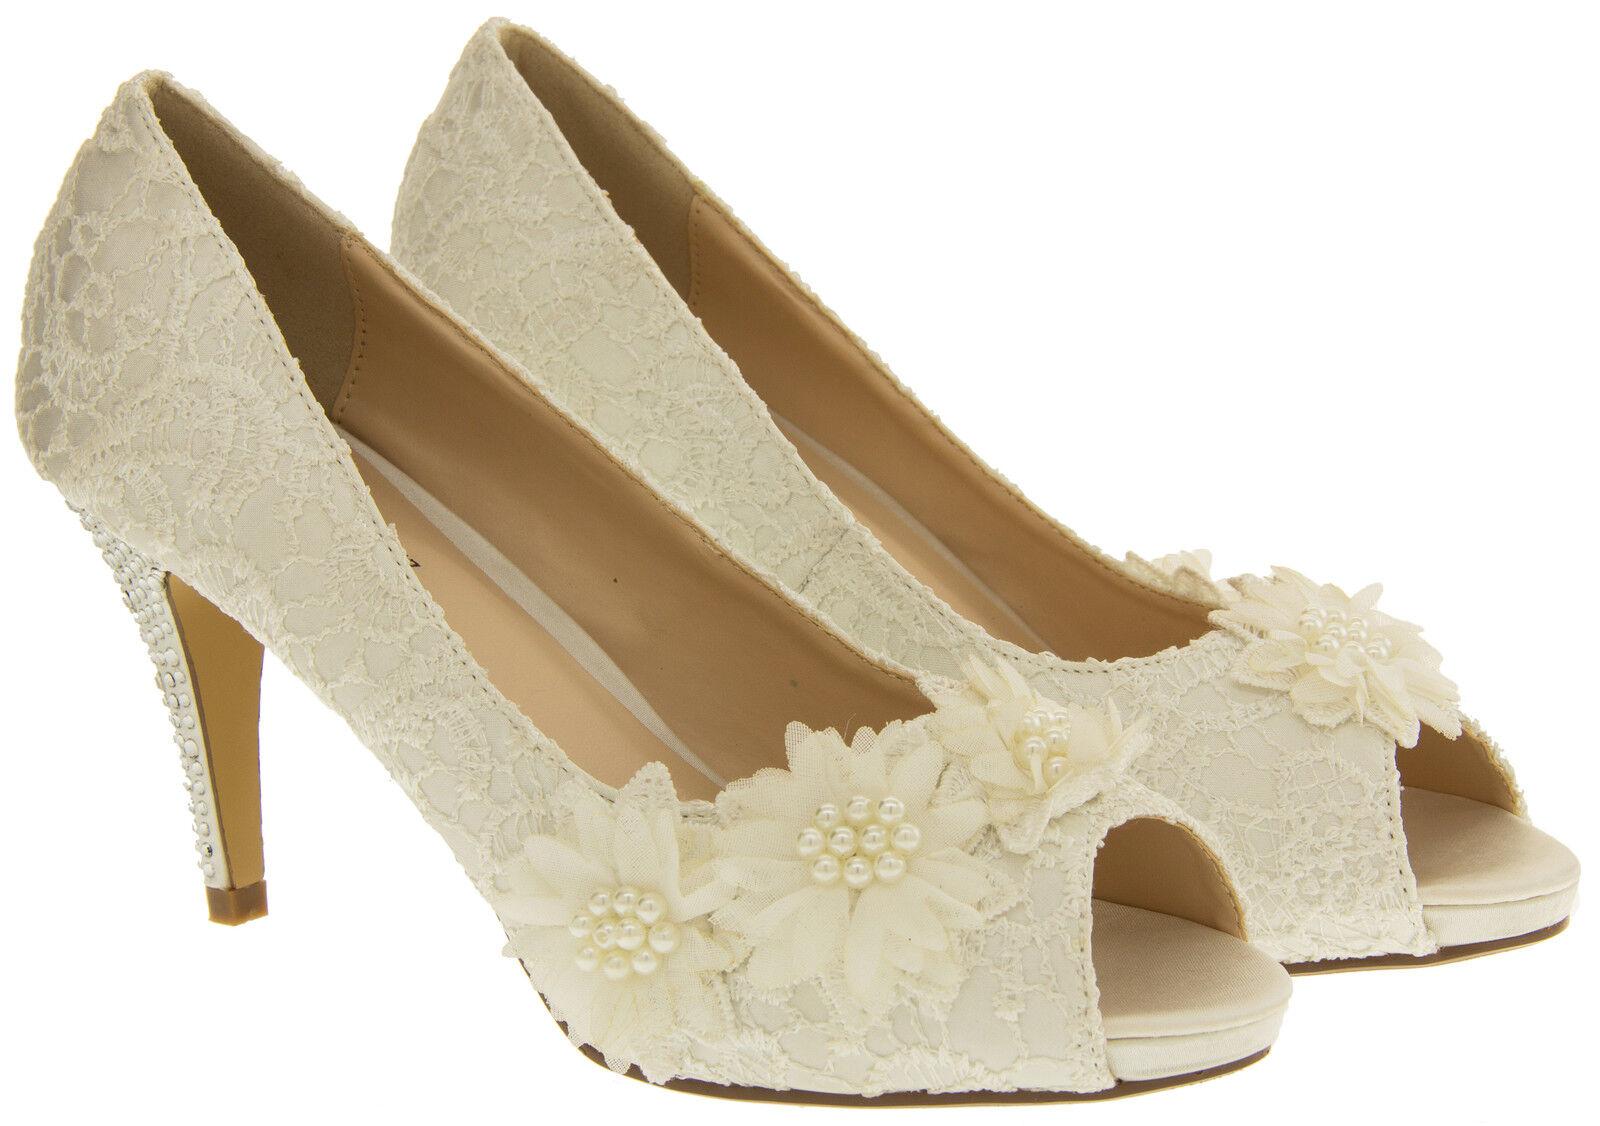 Ladies Ivory Bridal Heels Lace Satin Wedding Shoes Brides Diamante Court Size 3